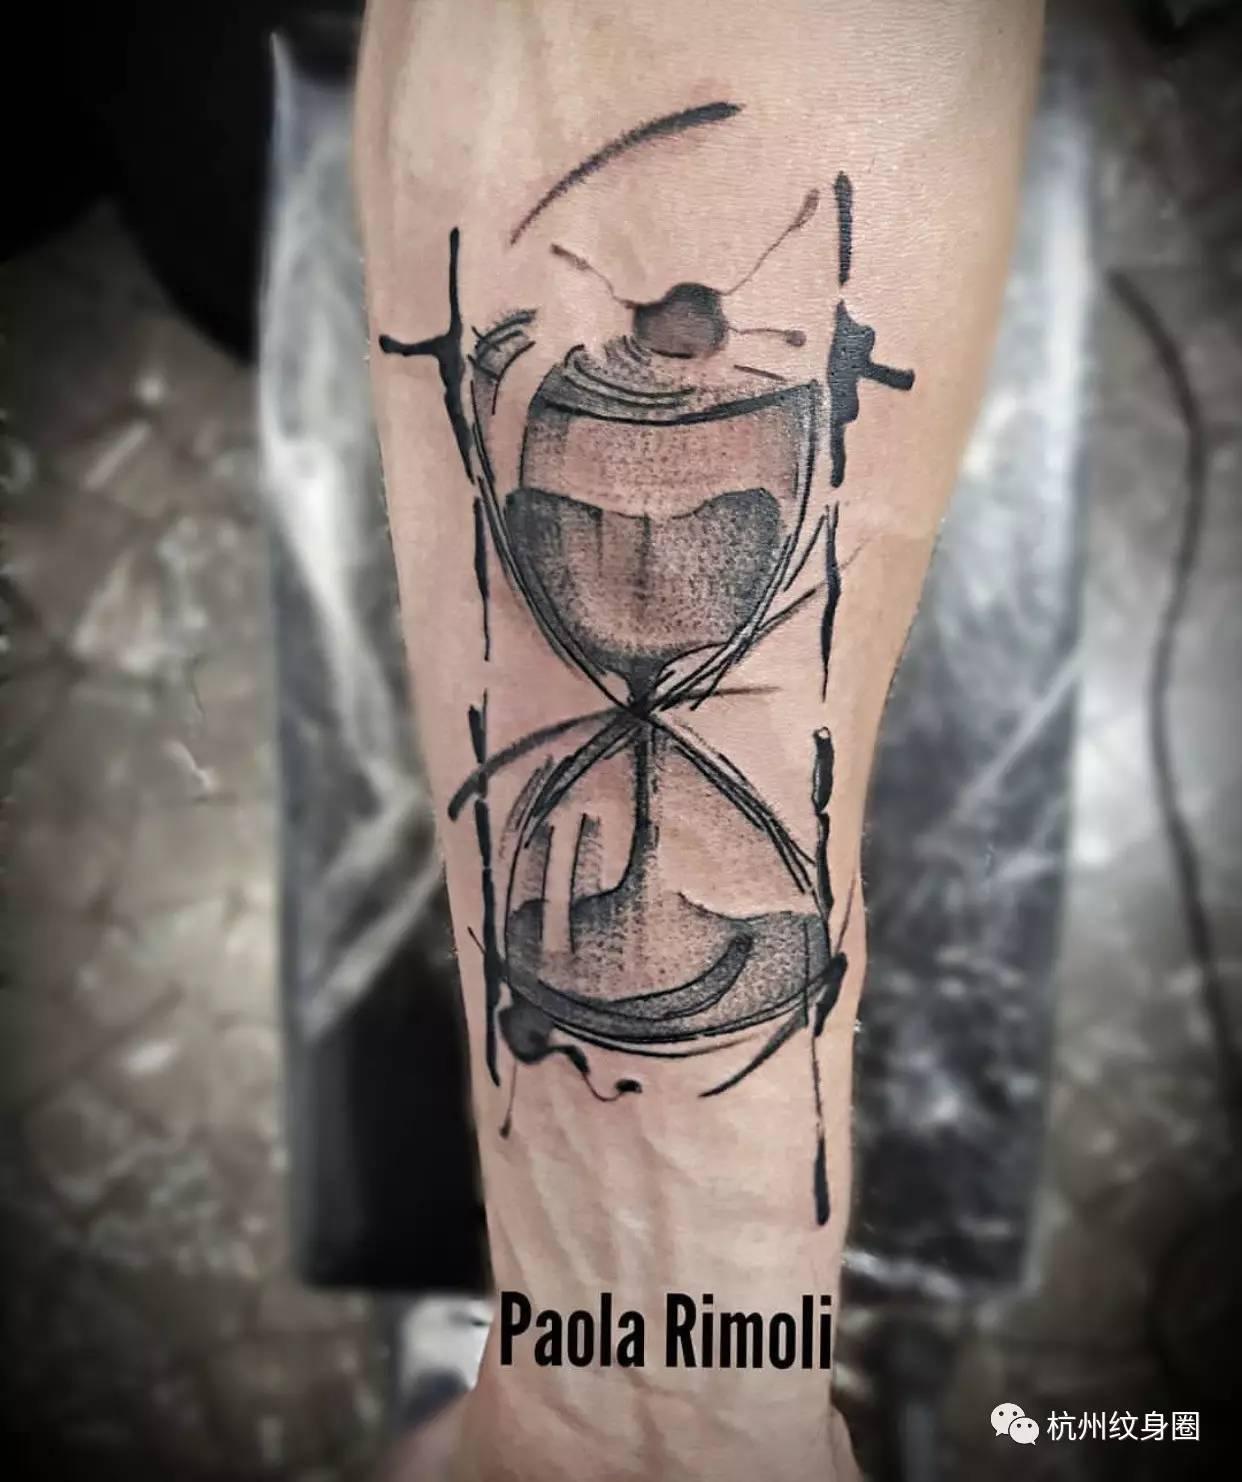 tattoo | 纹身素材:沙漏